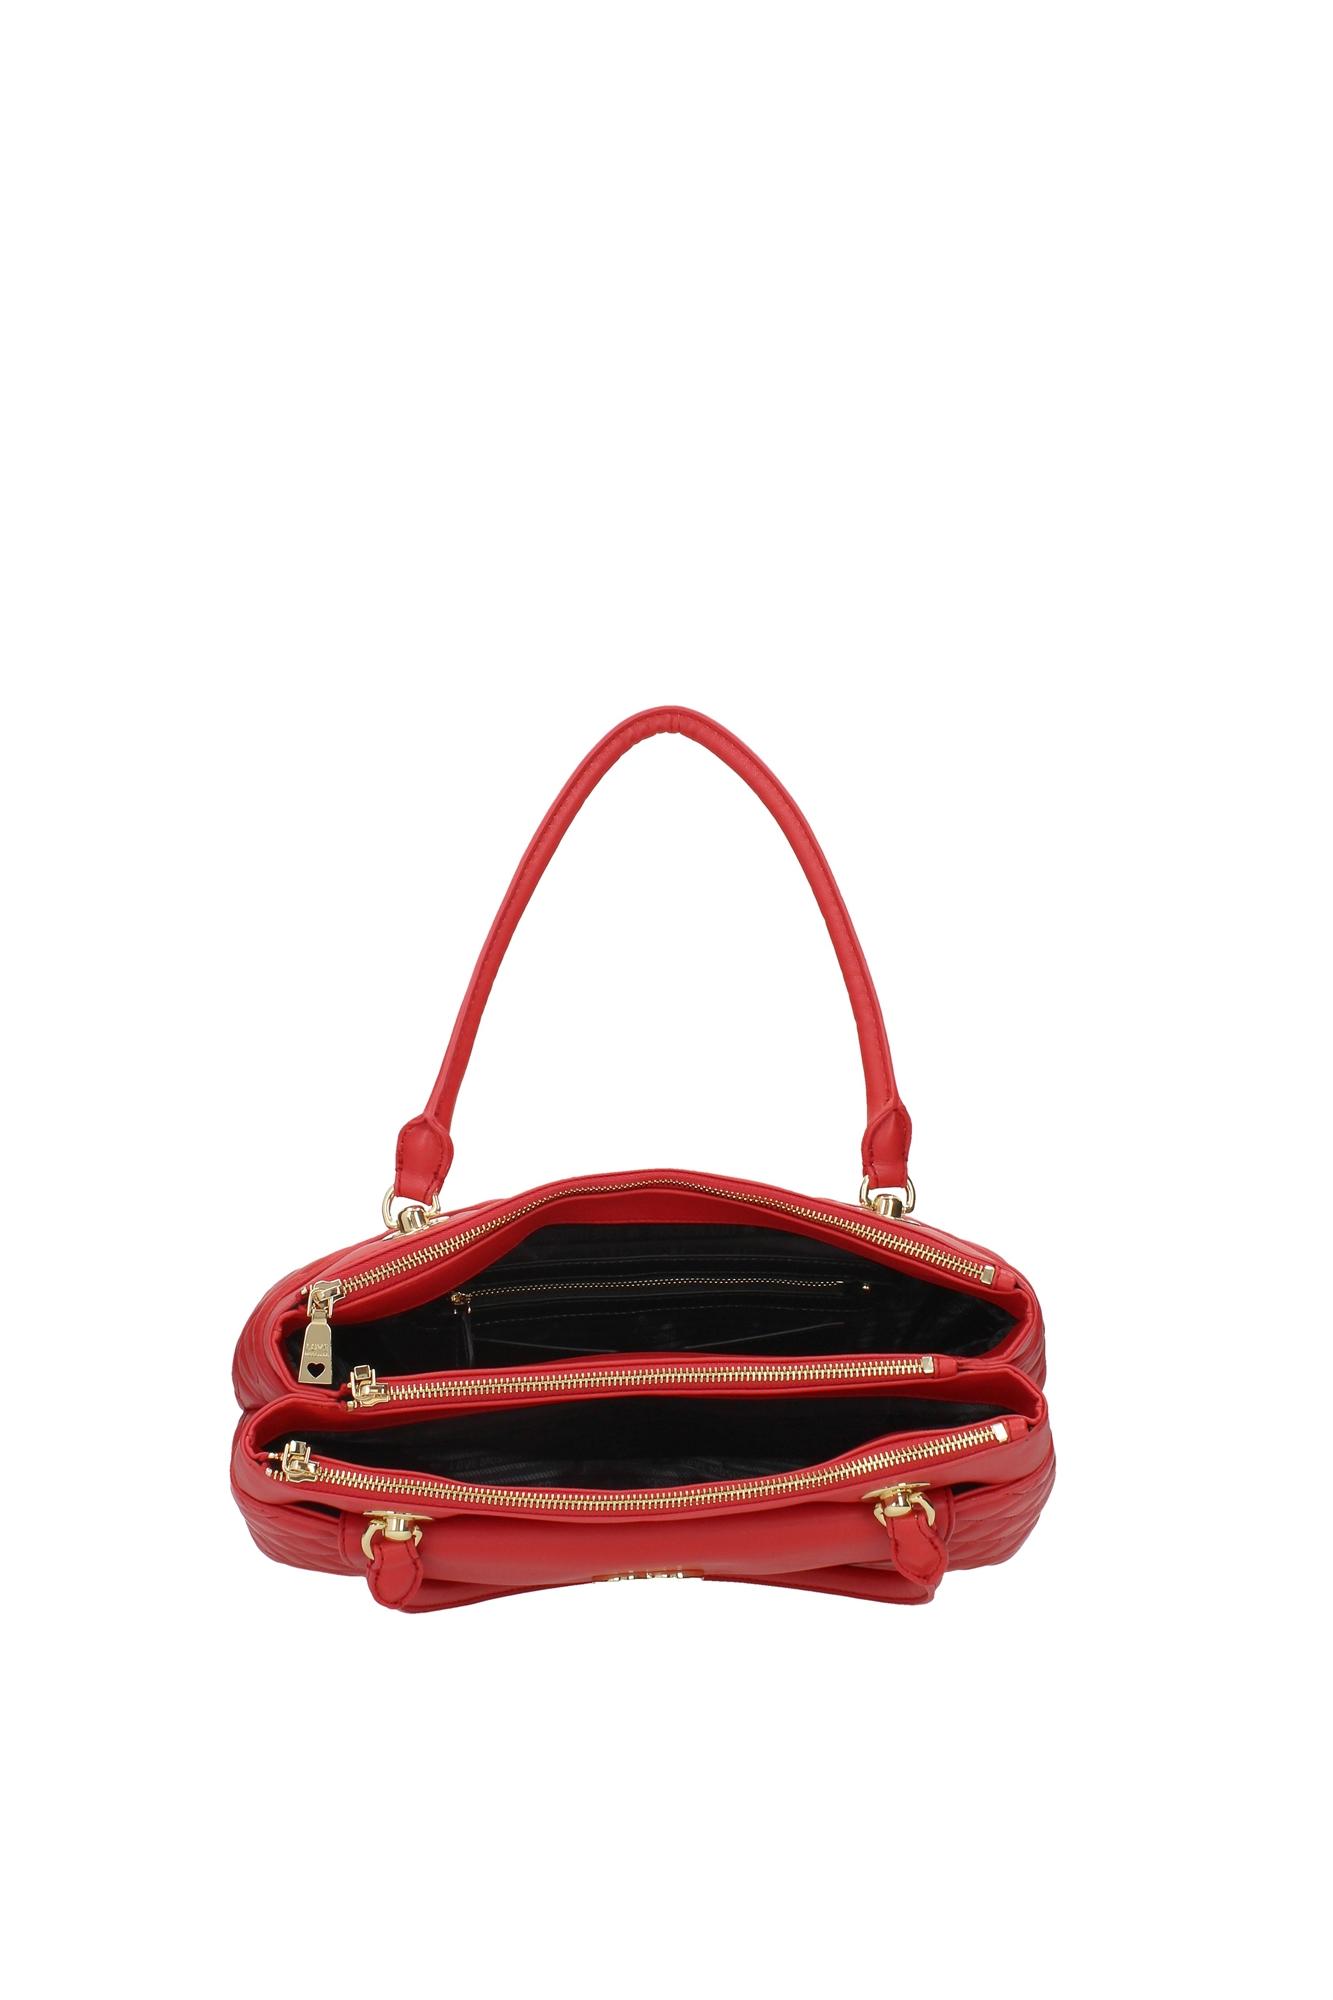 handtasche love moschino damen polyurethan rot jc4004pp12la0500 ebay. Black Bedroom Furniture Sets. Home Design Ideas